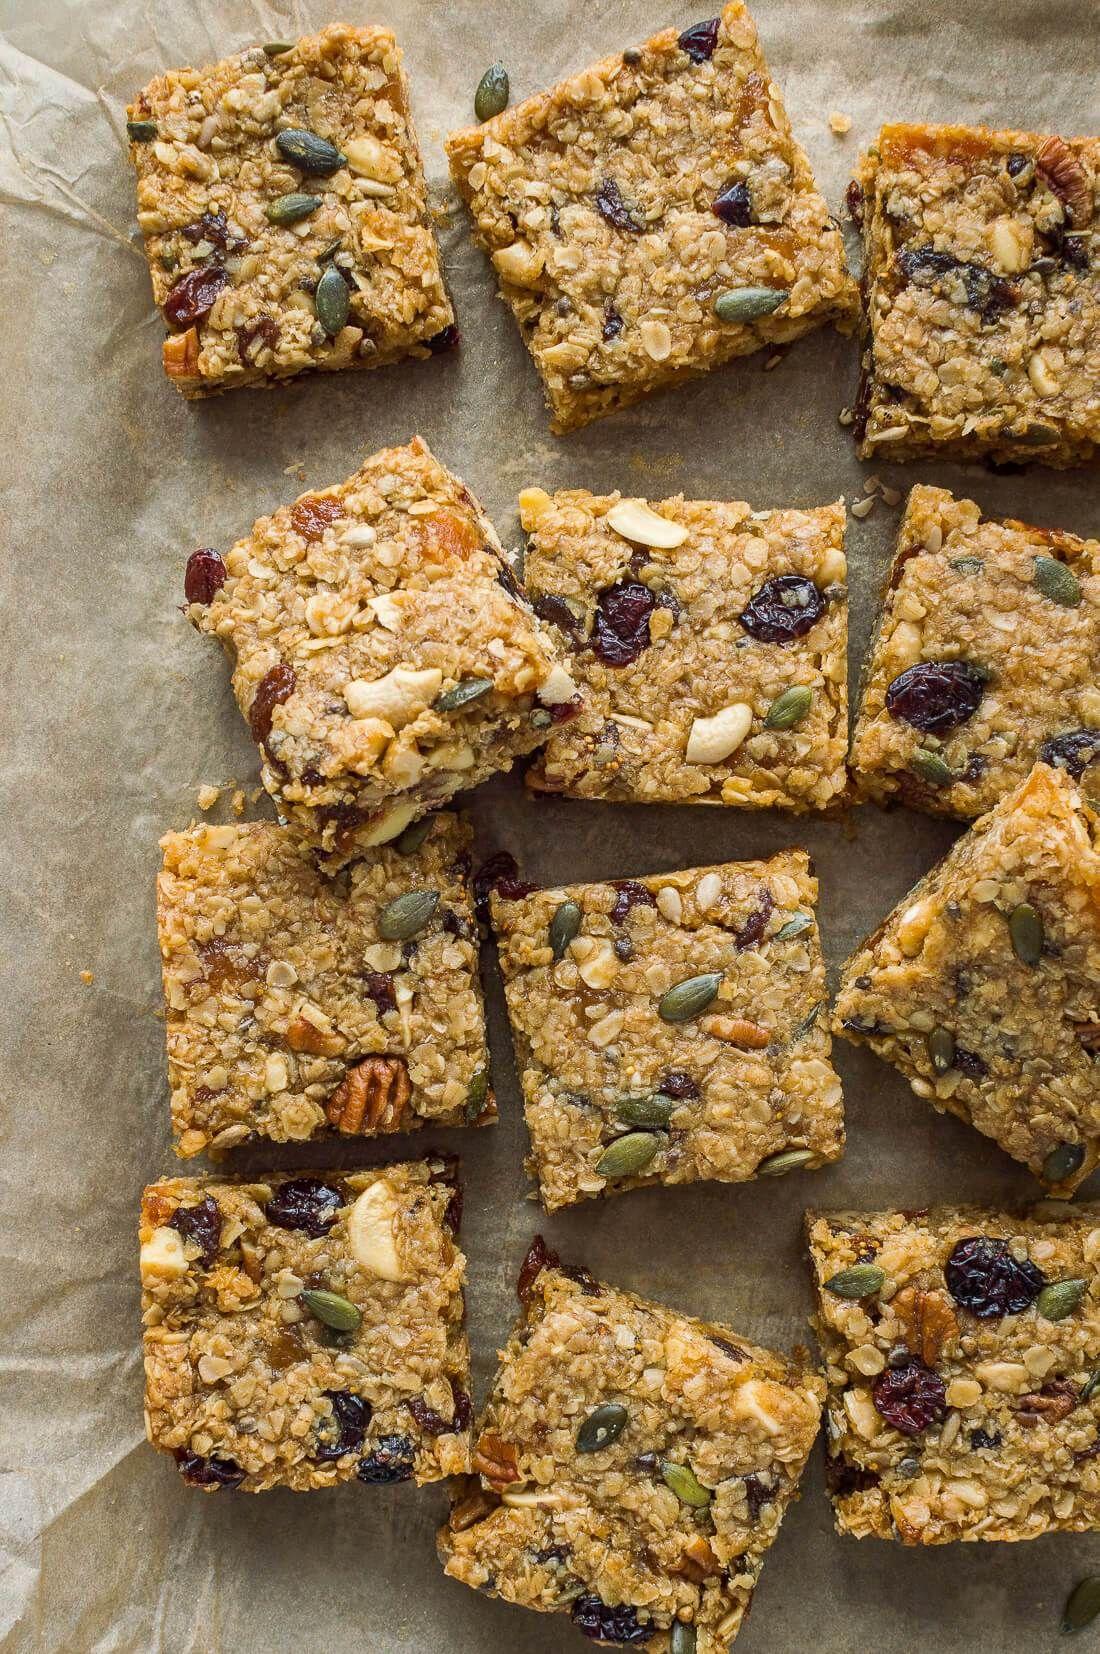 47 Recipe Tasty Fruity Flapjacks: Squares Of Vegan Fruit And Nut Flapjacks On A Baking